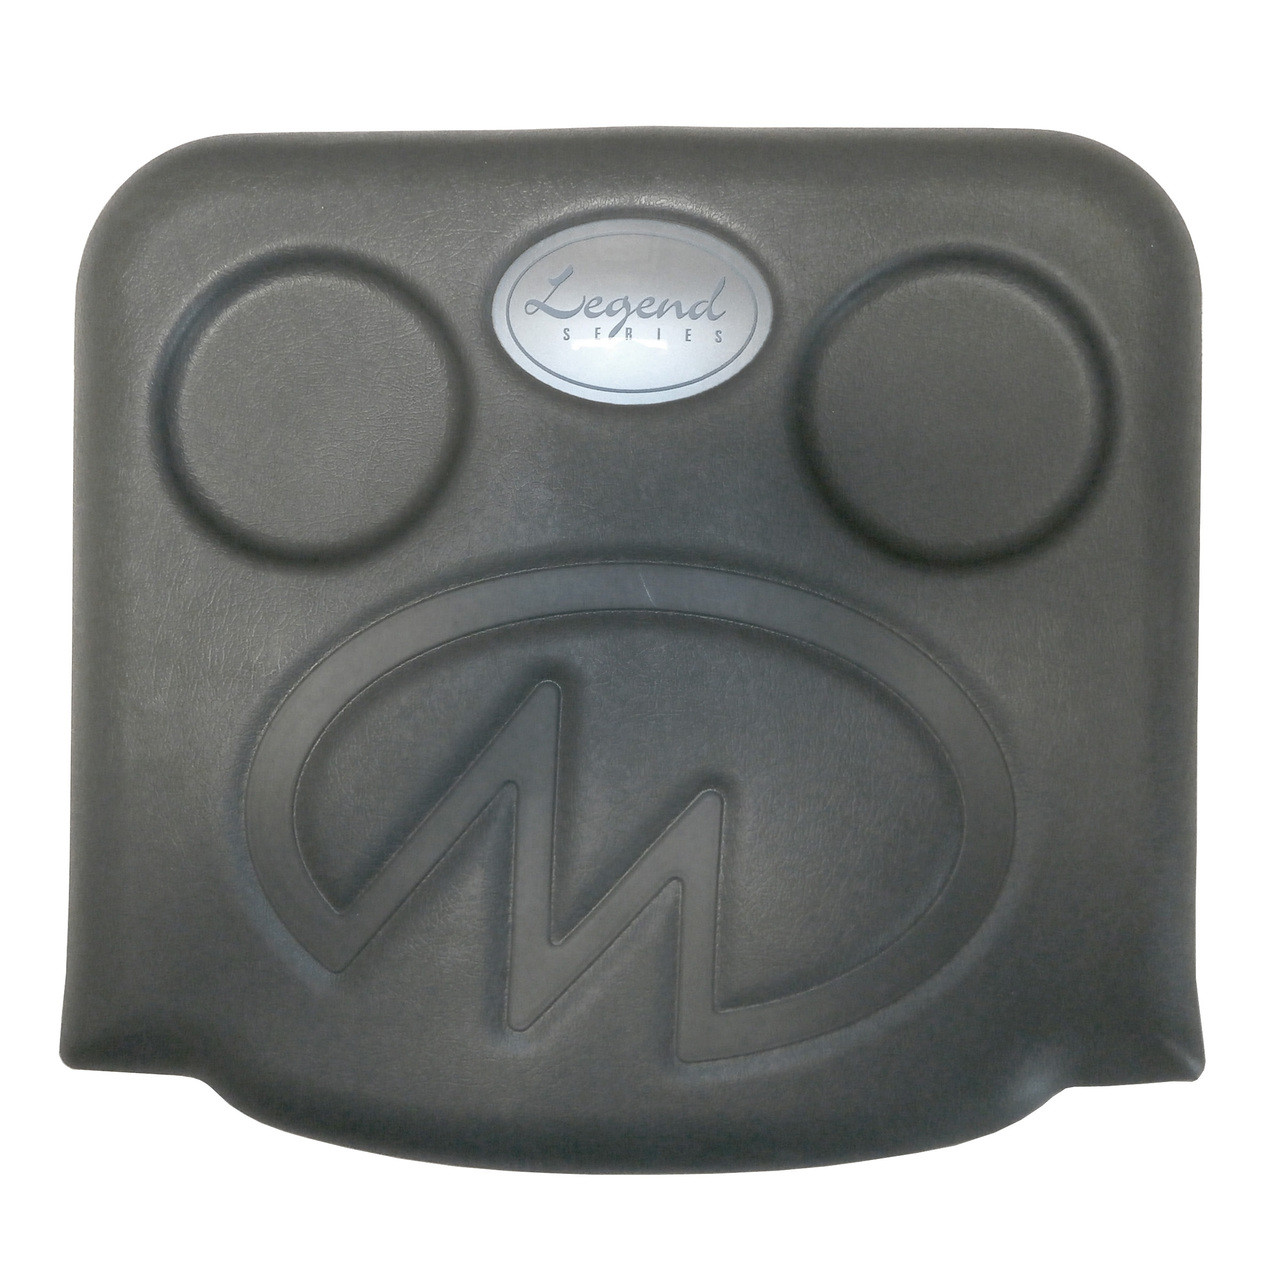 Master Spa - X540745 - Filter Lid - Legend Series LSX 557 Charcoal Filter Lid (X540745)